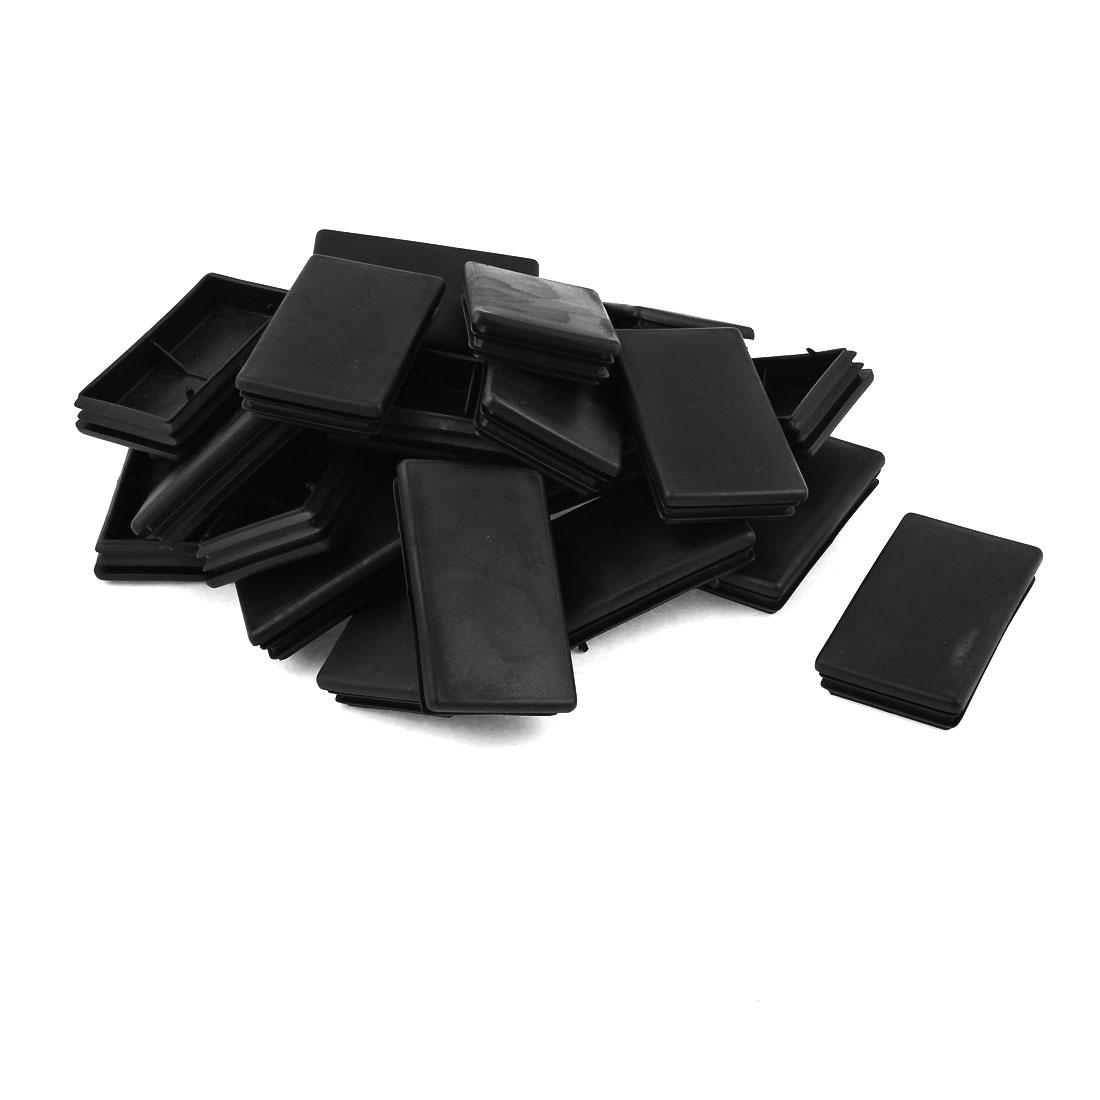 24 Pcs Black Plastic Rectangle Blanking End Caps Tubing Tube Inserts 45mm x 75mm